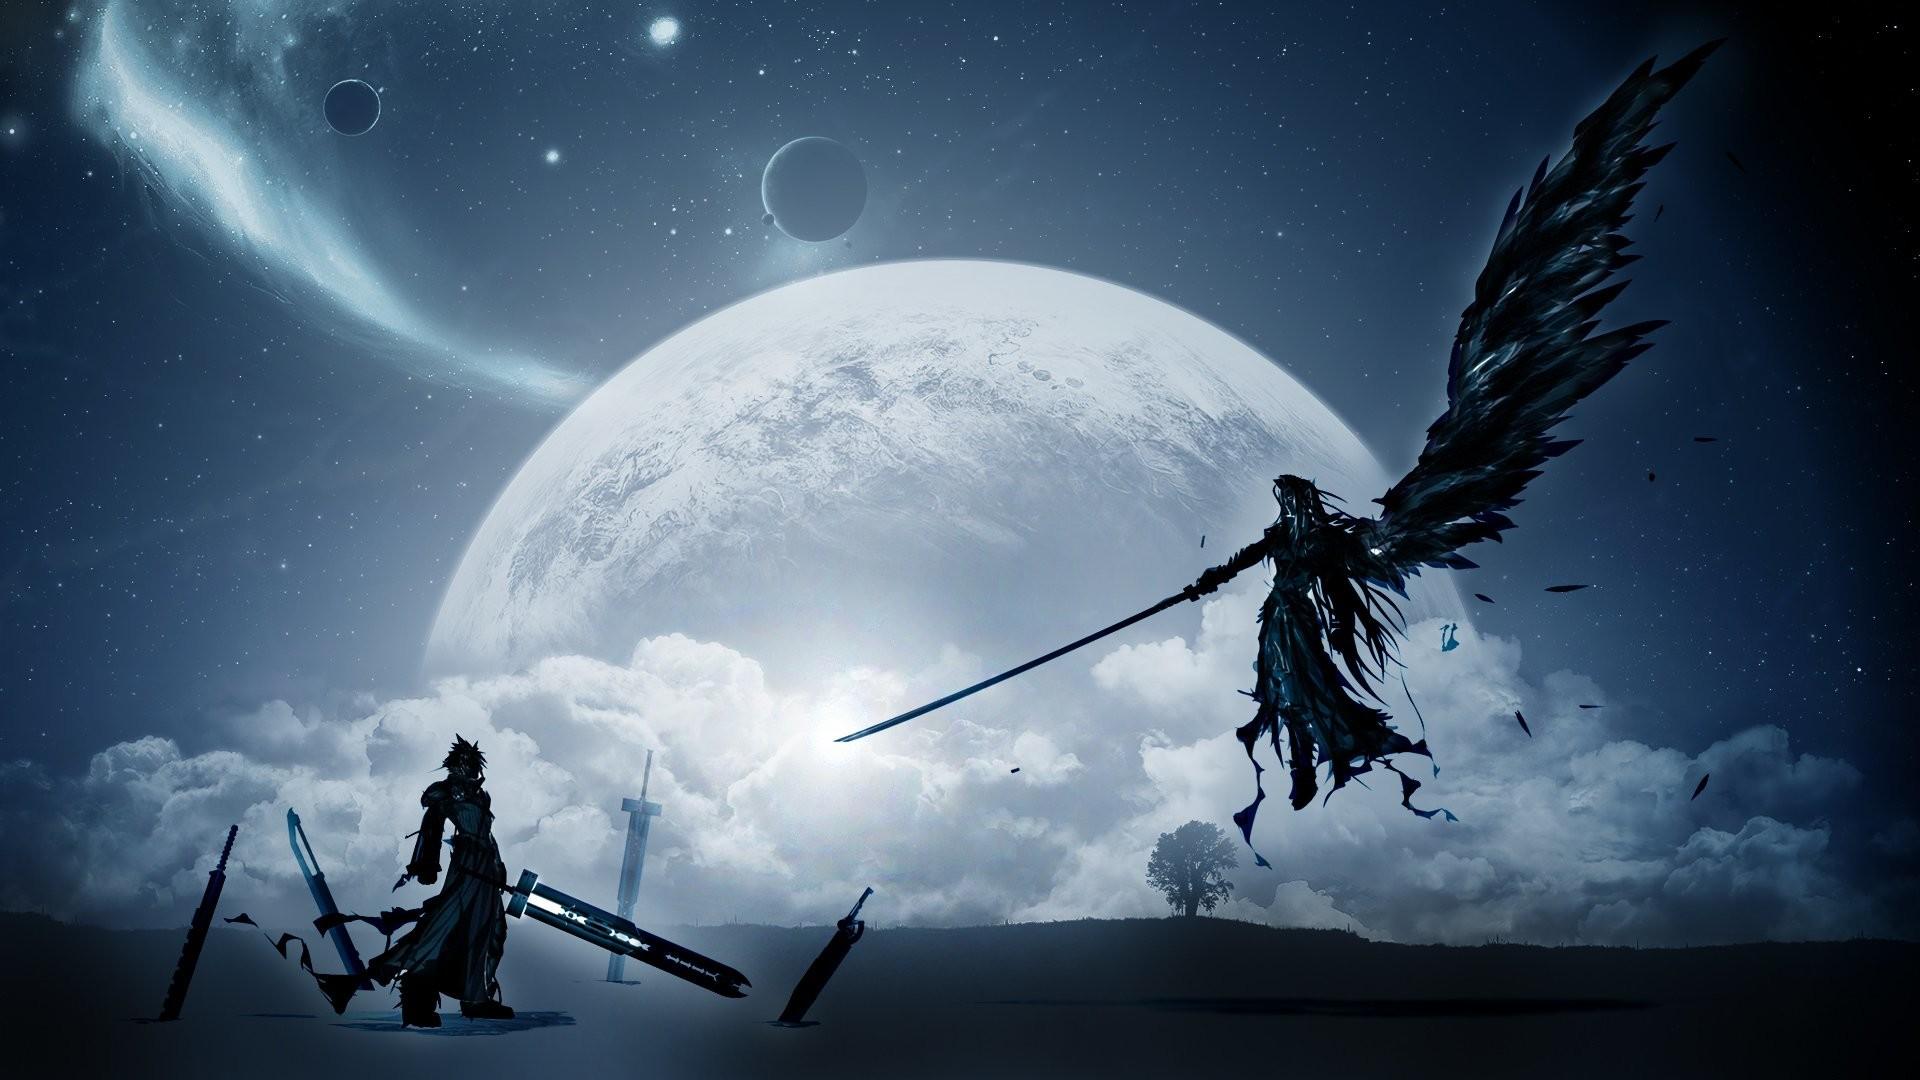 Cloud Final Fantasy Wallpaper 72 Pictures